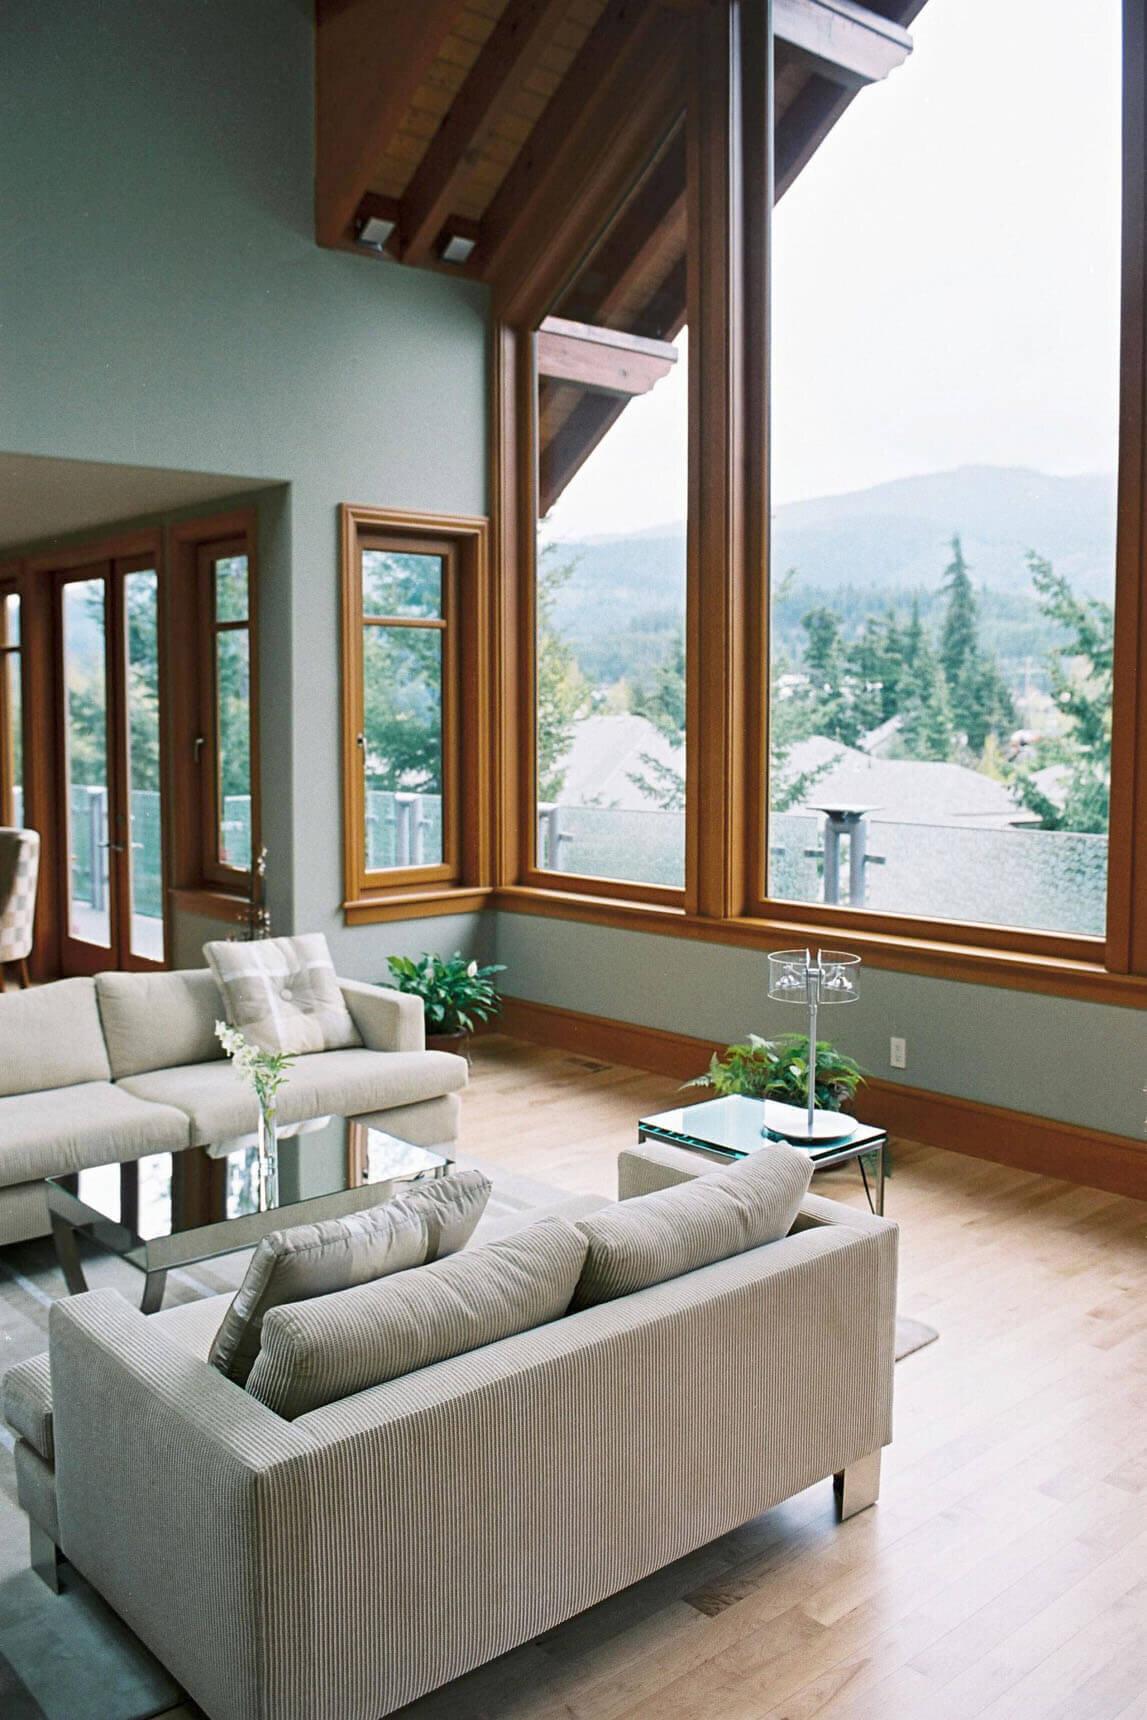 wsi-imageoptim-Contemporary-livingroom-reno-Whistler.jpg